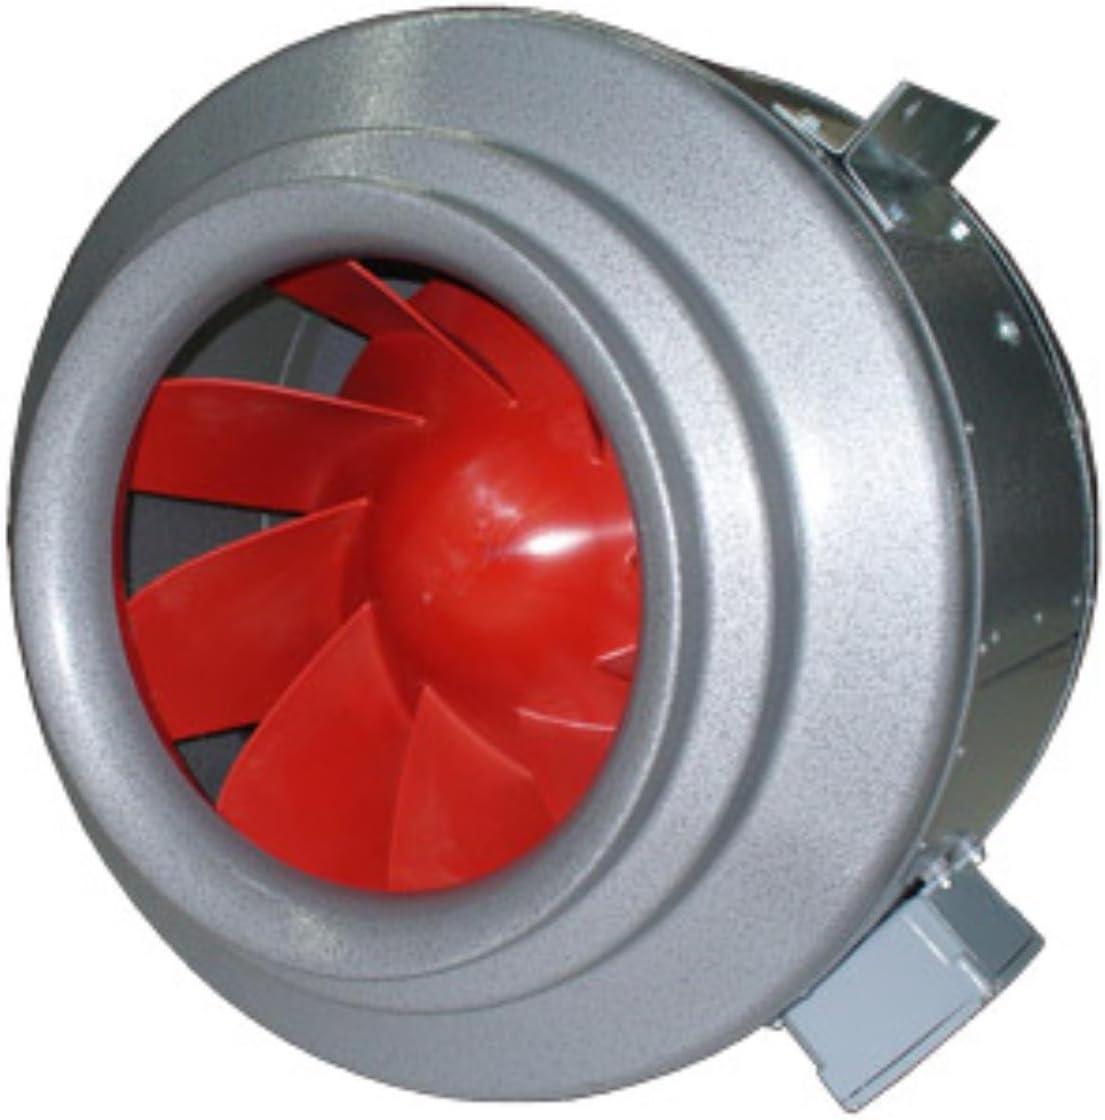 Vortex Powerfans VORTEX Quantity limited Bombing free shipping INLINE FAN 736691 14